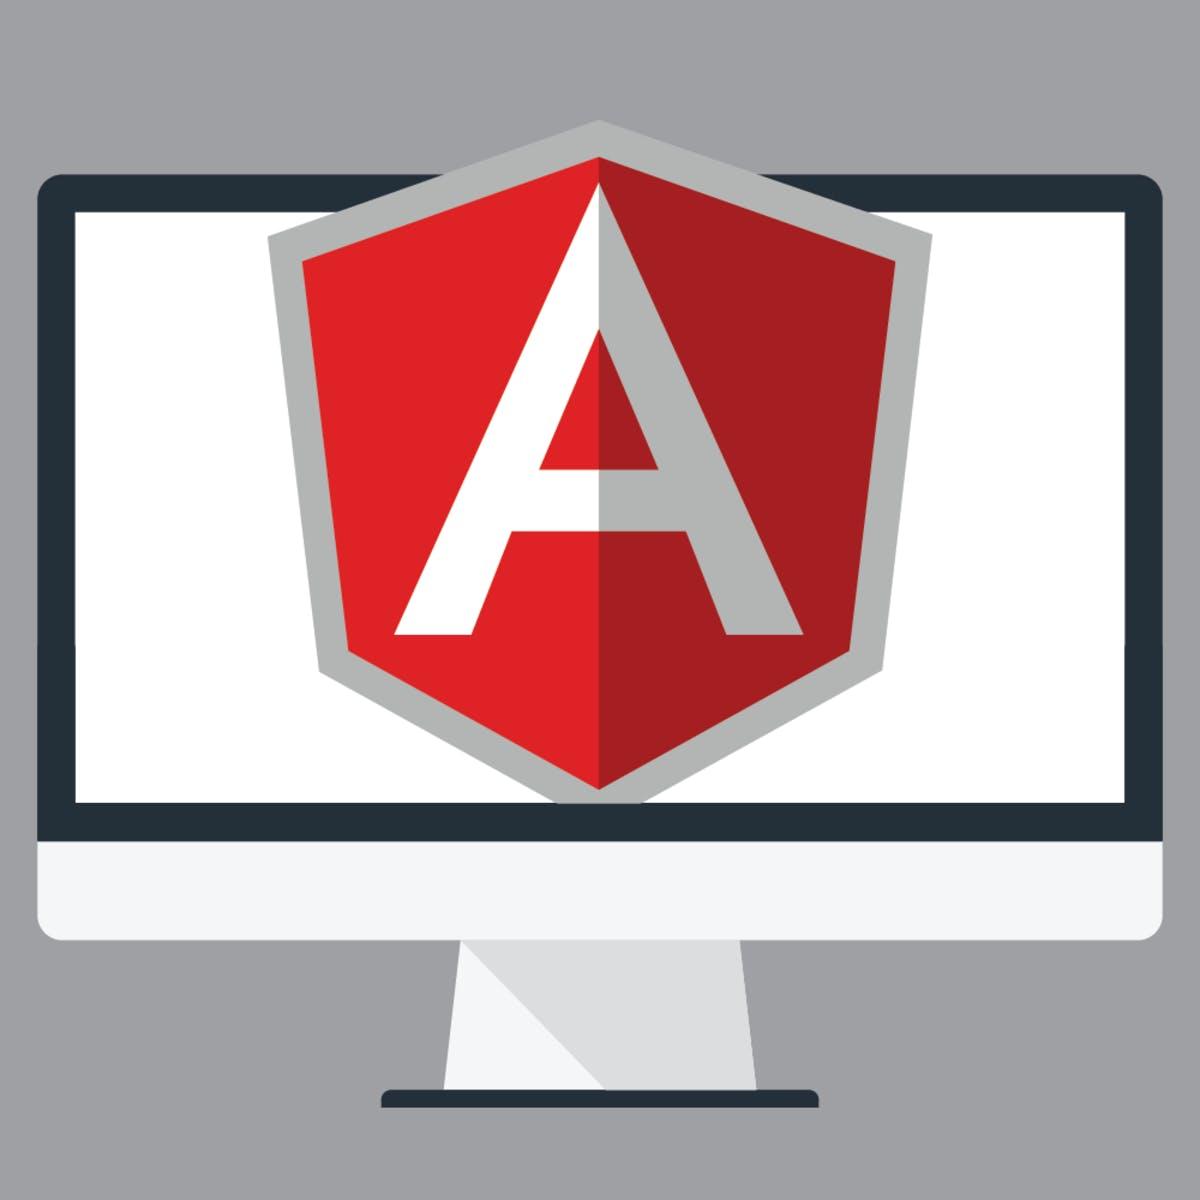 Single Page Web Applications with AngularJS